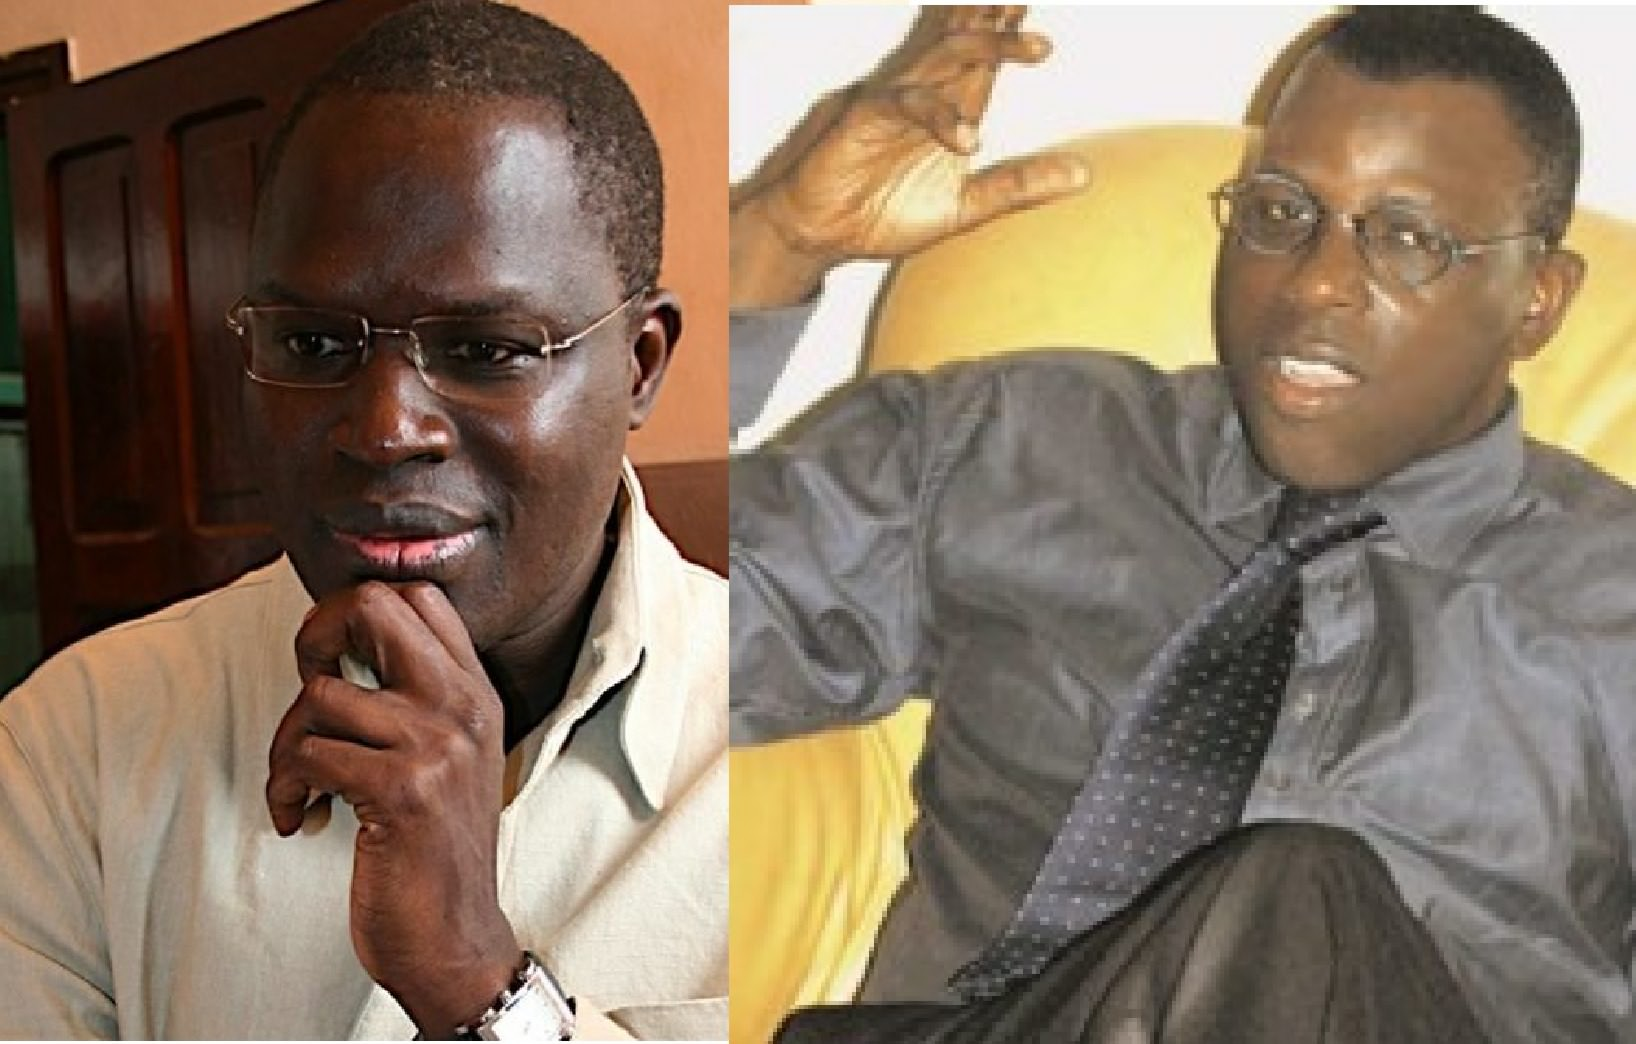 Délibéré Cheikh Tall Dioum/Khalifa Sall : Les deux hommes fixés aujourd'hui